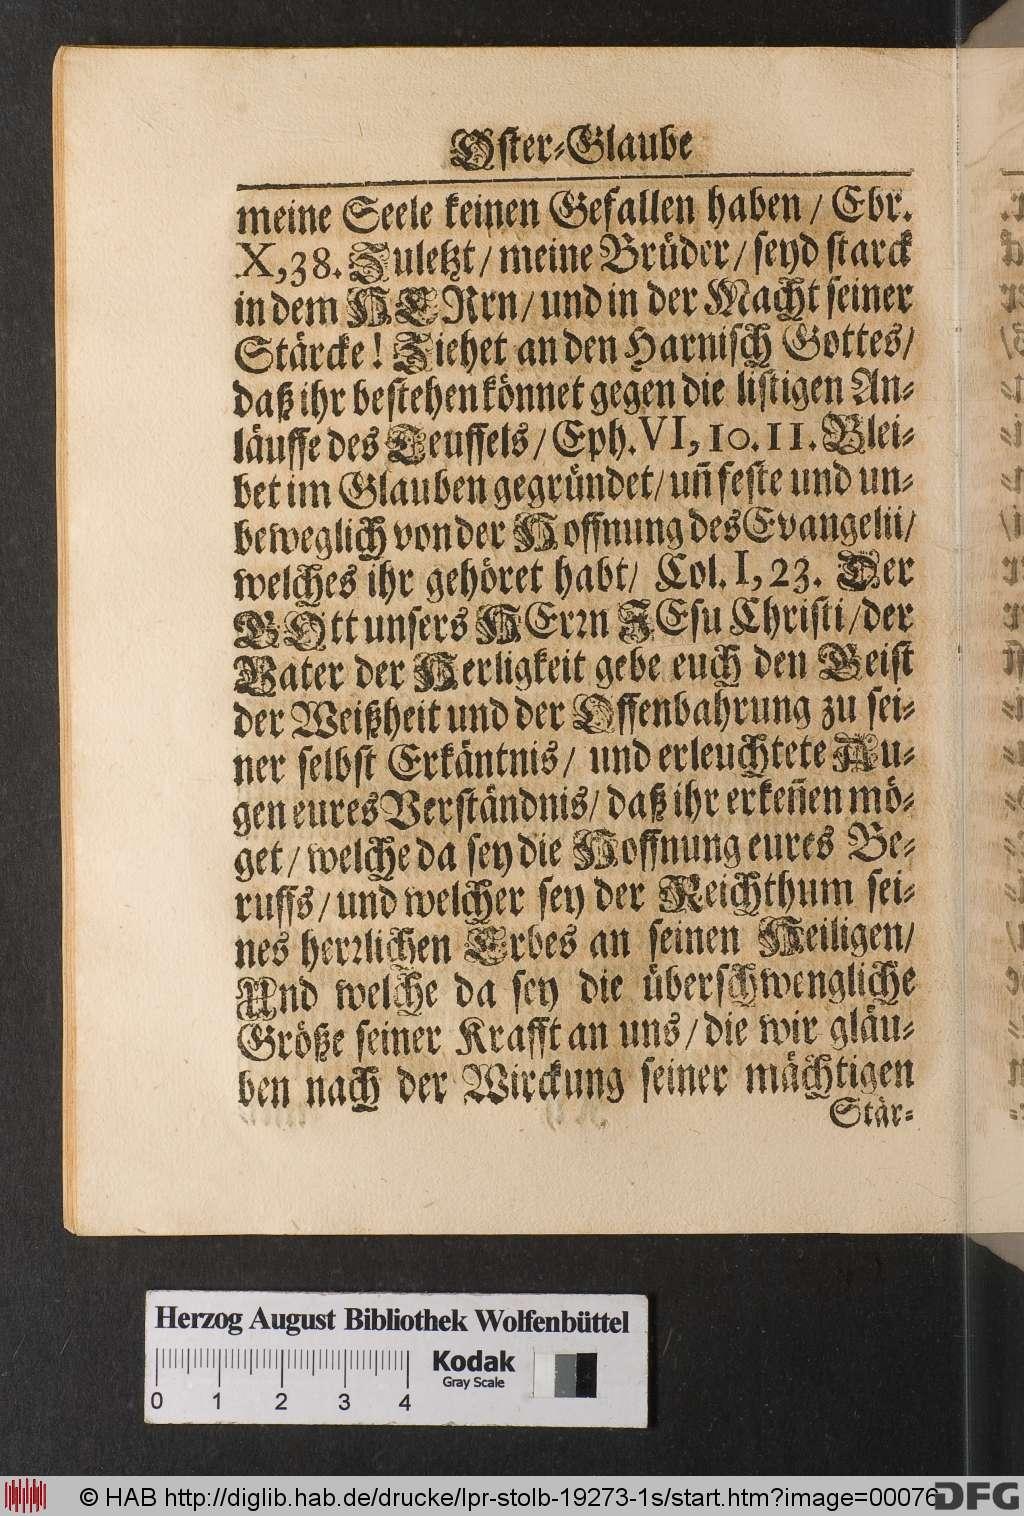 http://diglib.hab.de/drucke/lpr-stolb-19273-1s/00076.jpg